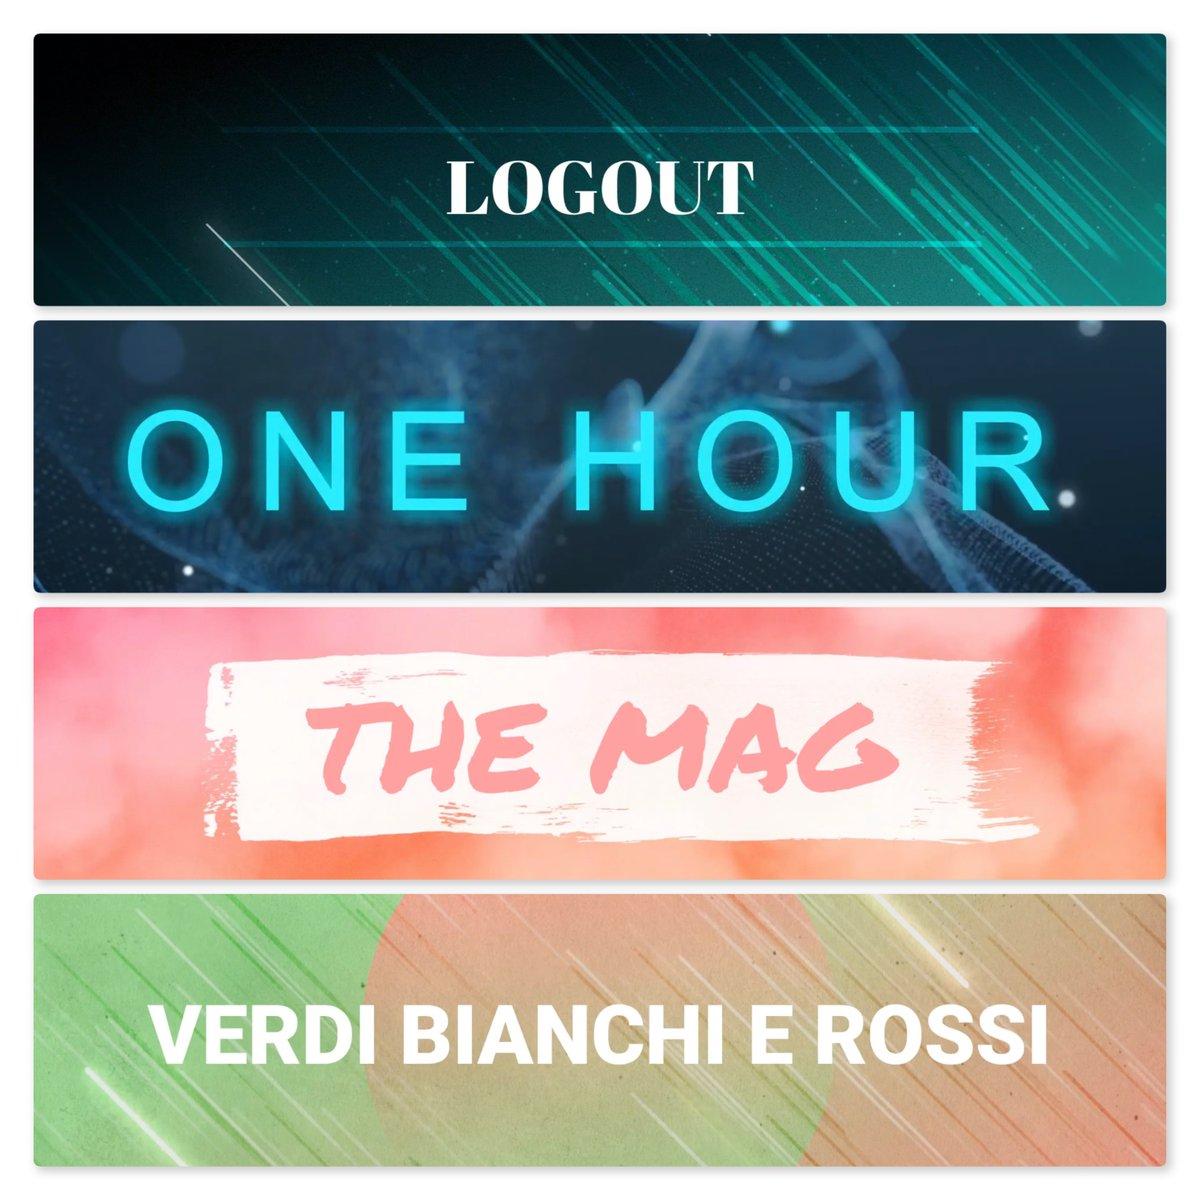 Pronti ad iniziare una nuova giornata insieme?  Dalle 8:00: LOGOUT - VERDI BIANCHI ROSSI - ONE HOUR - THE MAG  http://www.radiofm.net #radiofm #radiofmfaleria #artiste #beat #beats #bestsong #bumpin #love #TFLers #tweegrampic.twitter.com/vA3sW49WwU